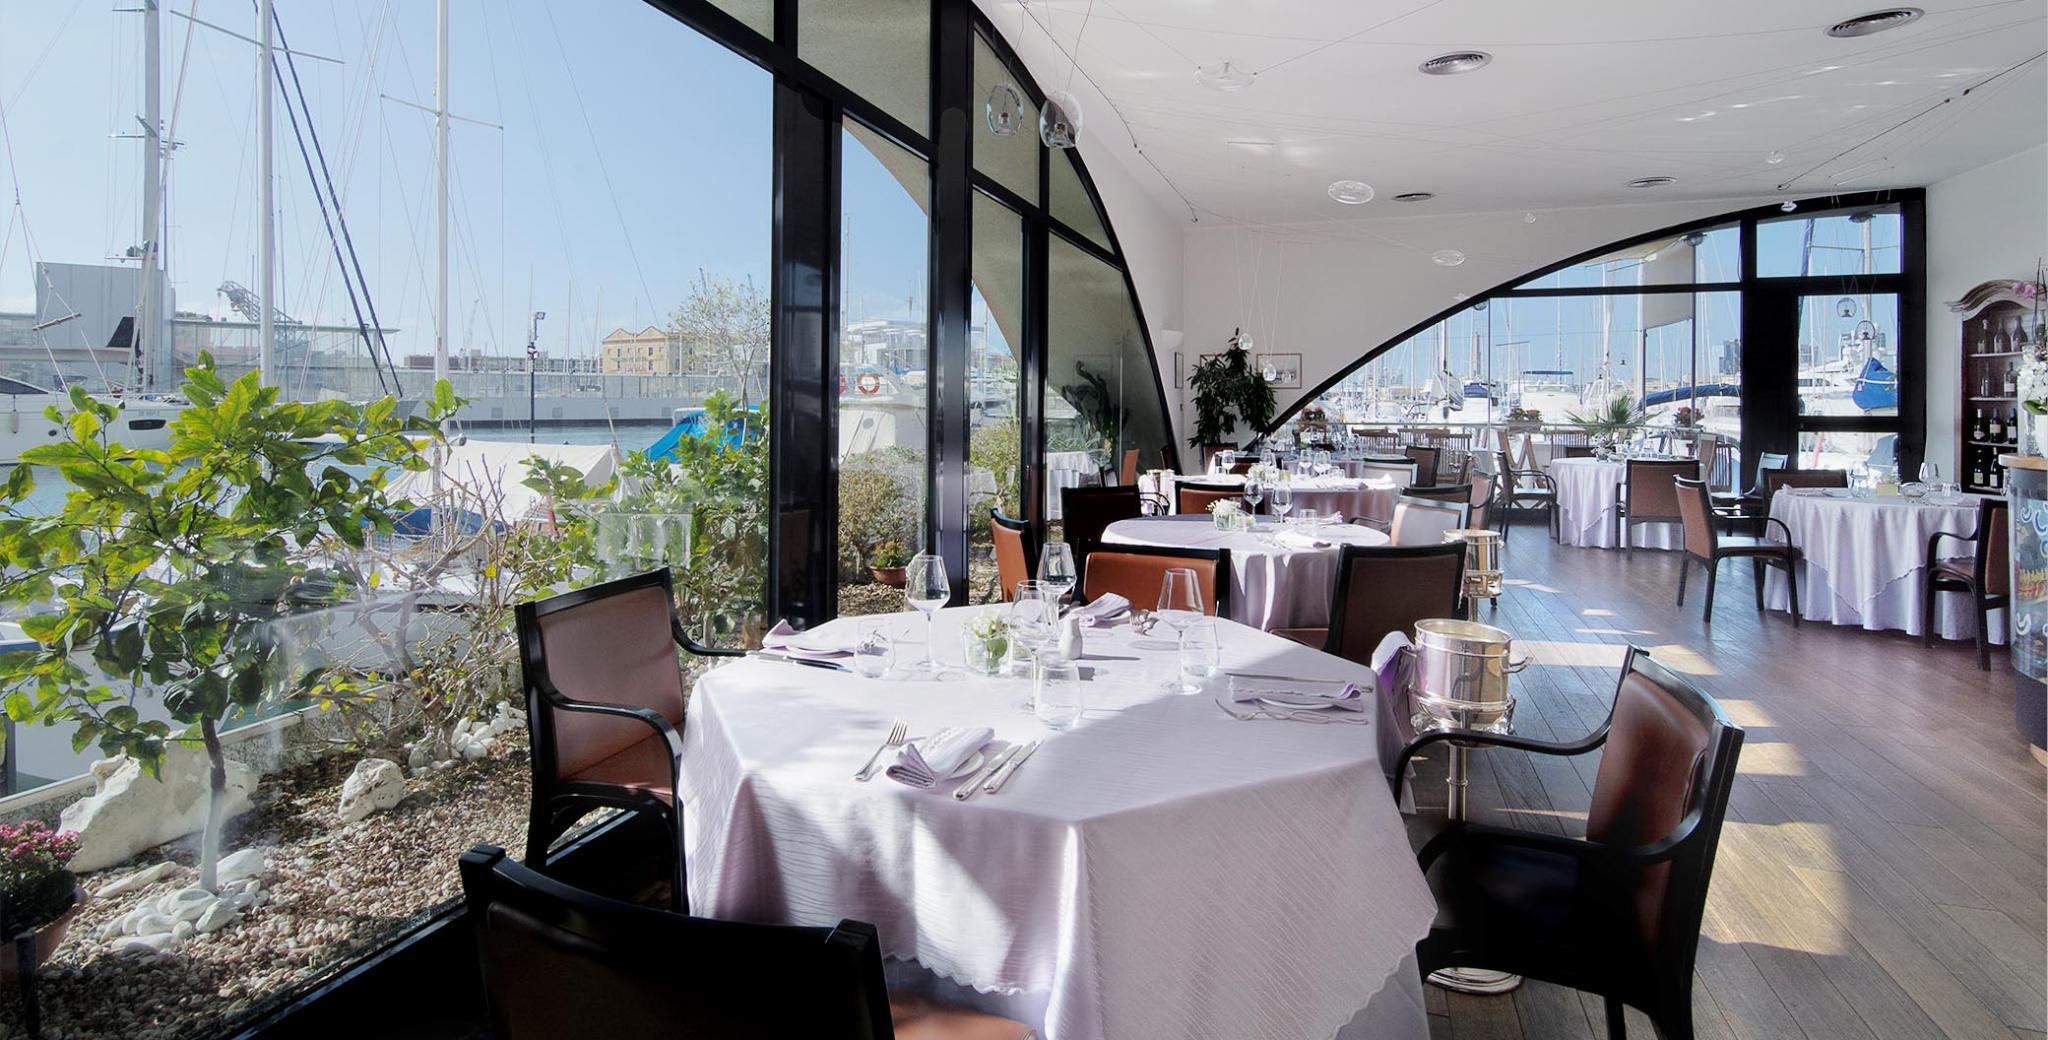 Servizi fotografici ristoranti bar locali Genova